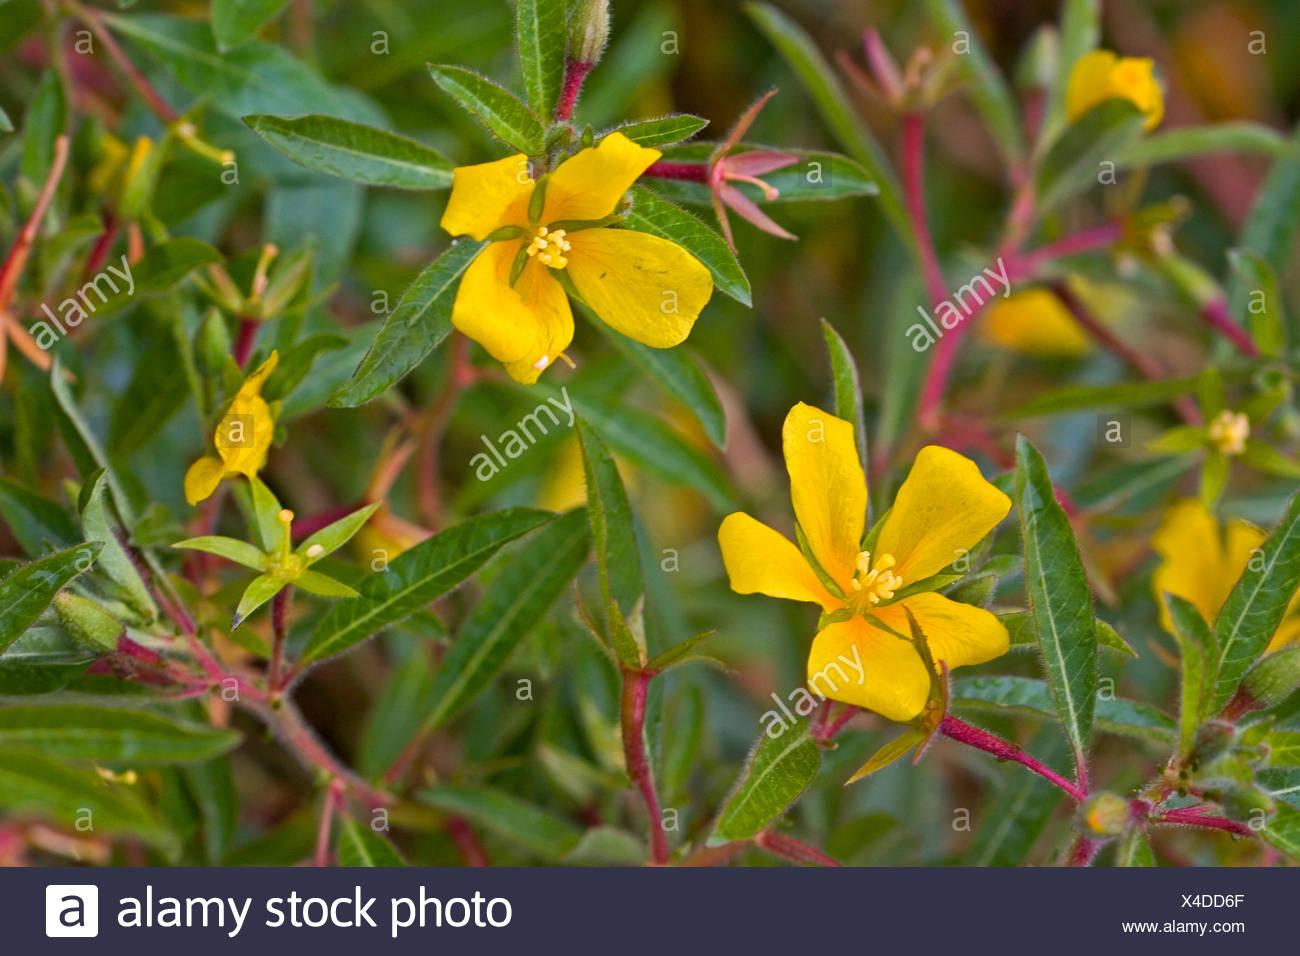 Perennial water primrose, Uruguay waterprimrose (Ludwigia grandiflora, Ludwigia uruguayensis, Jussiaea grandiflora), blooming, Germany Stock Photo